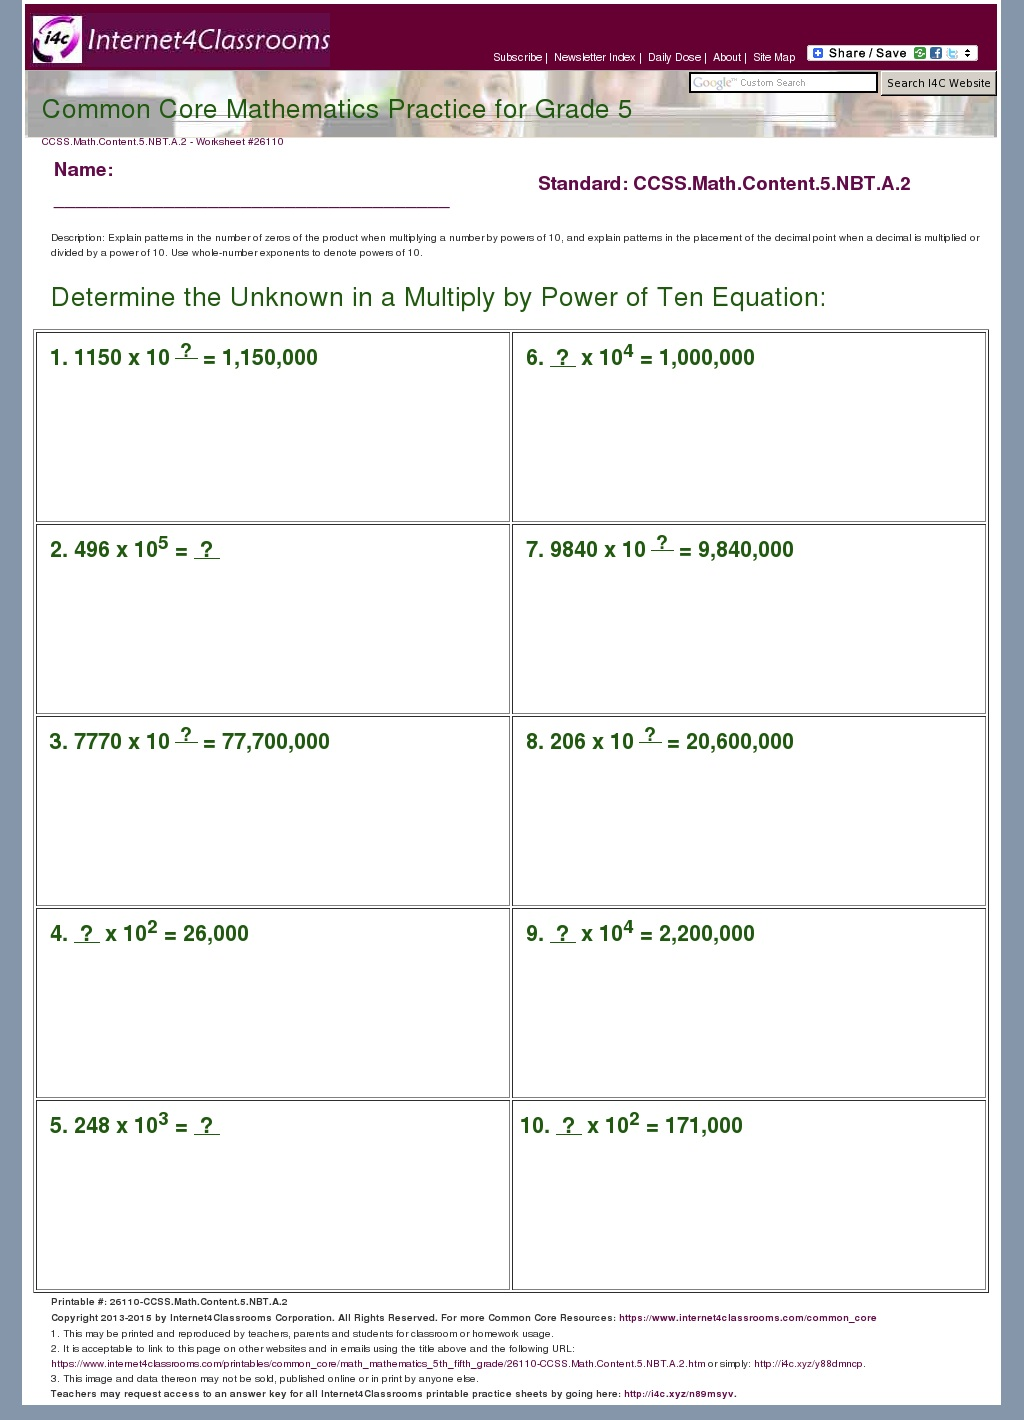 5 nbt 2 worksheets